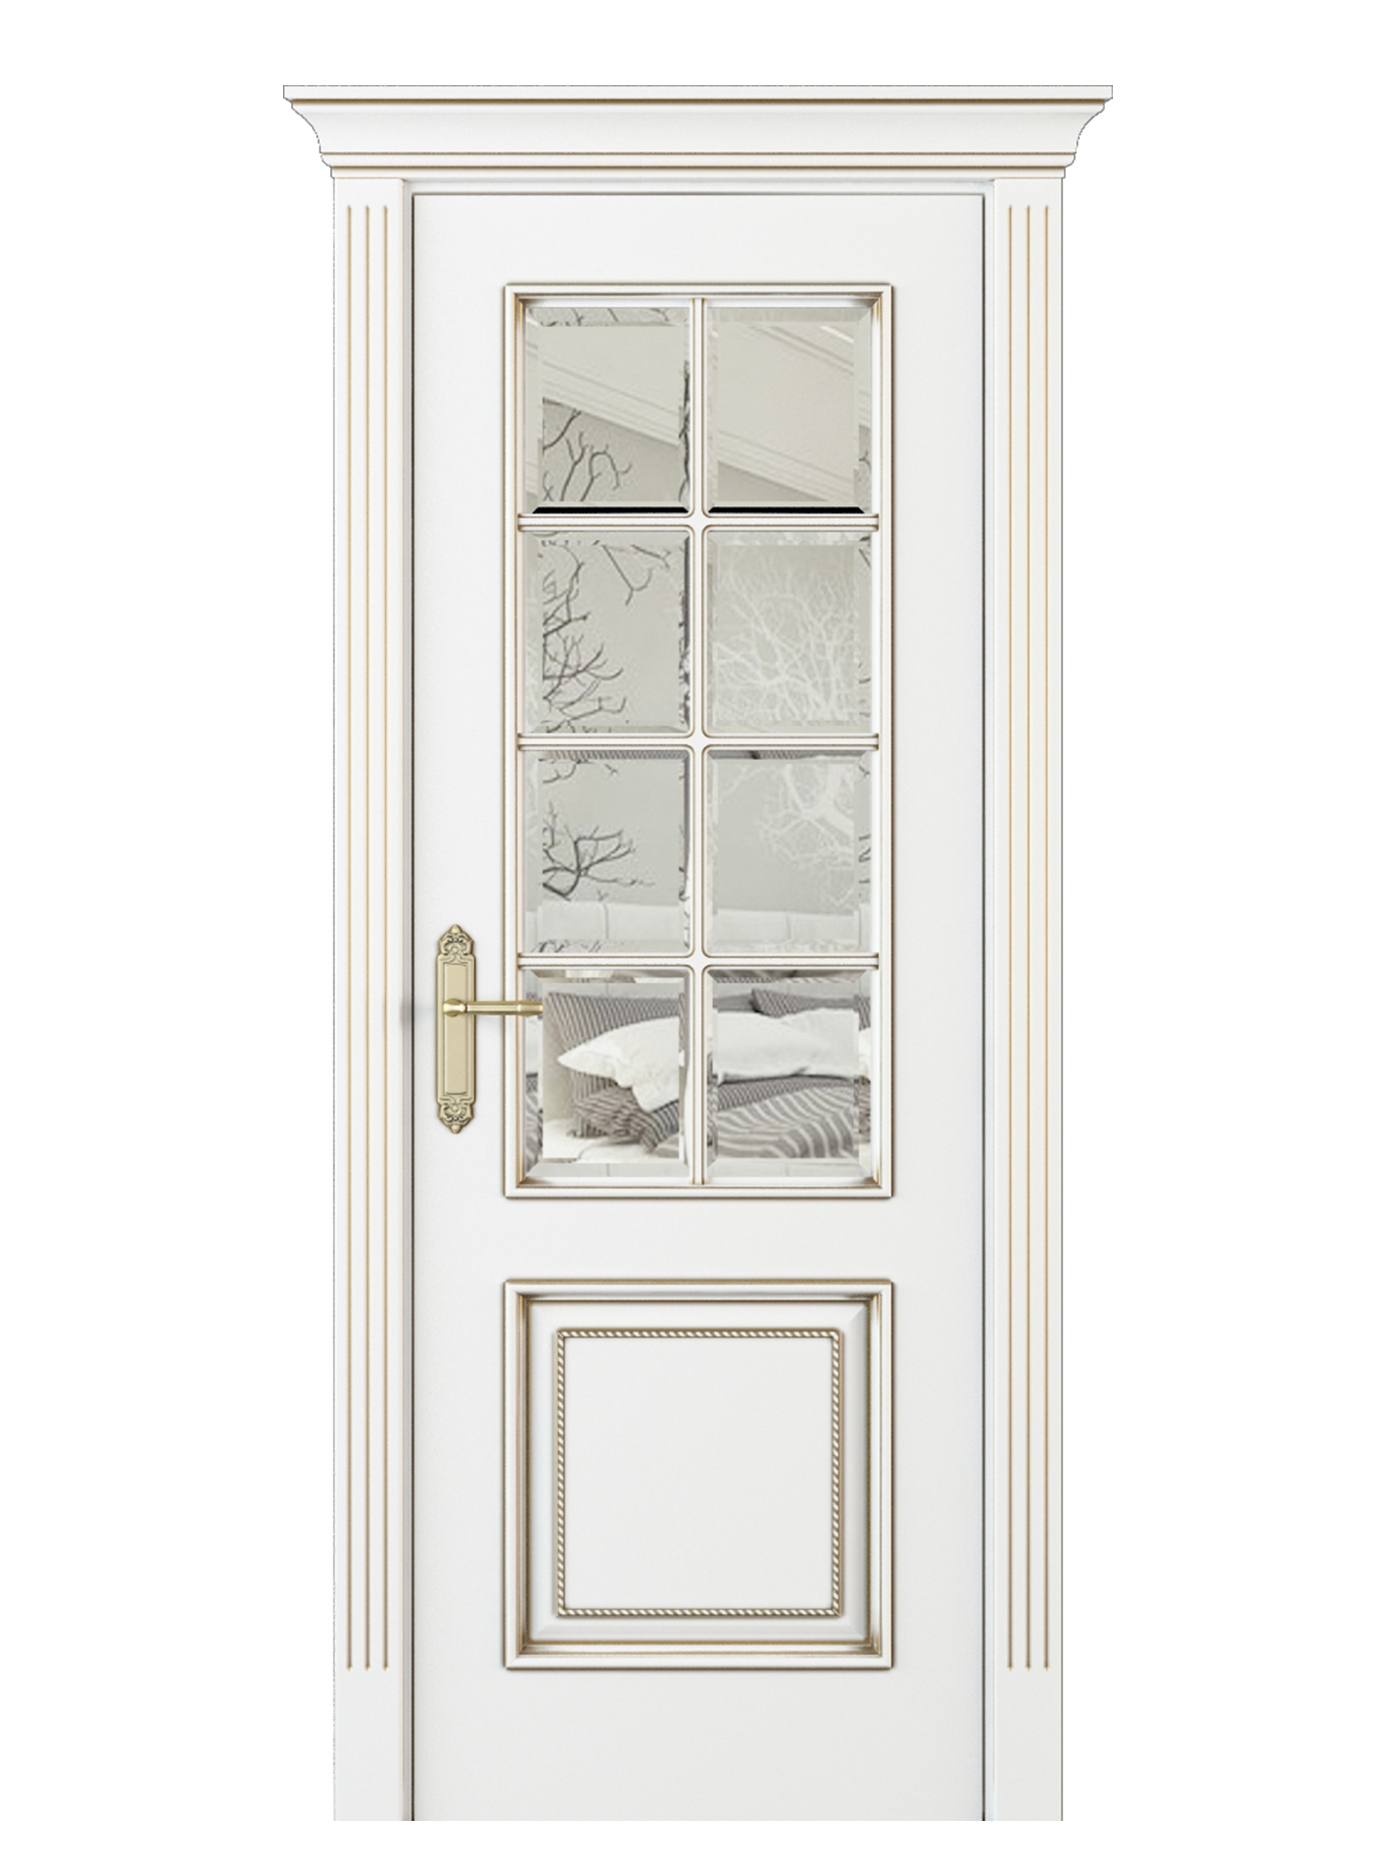 Parma Parte Interior Door Italian Enamel White Beveled Glass Indigo Doors